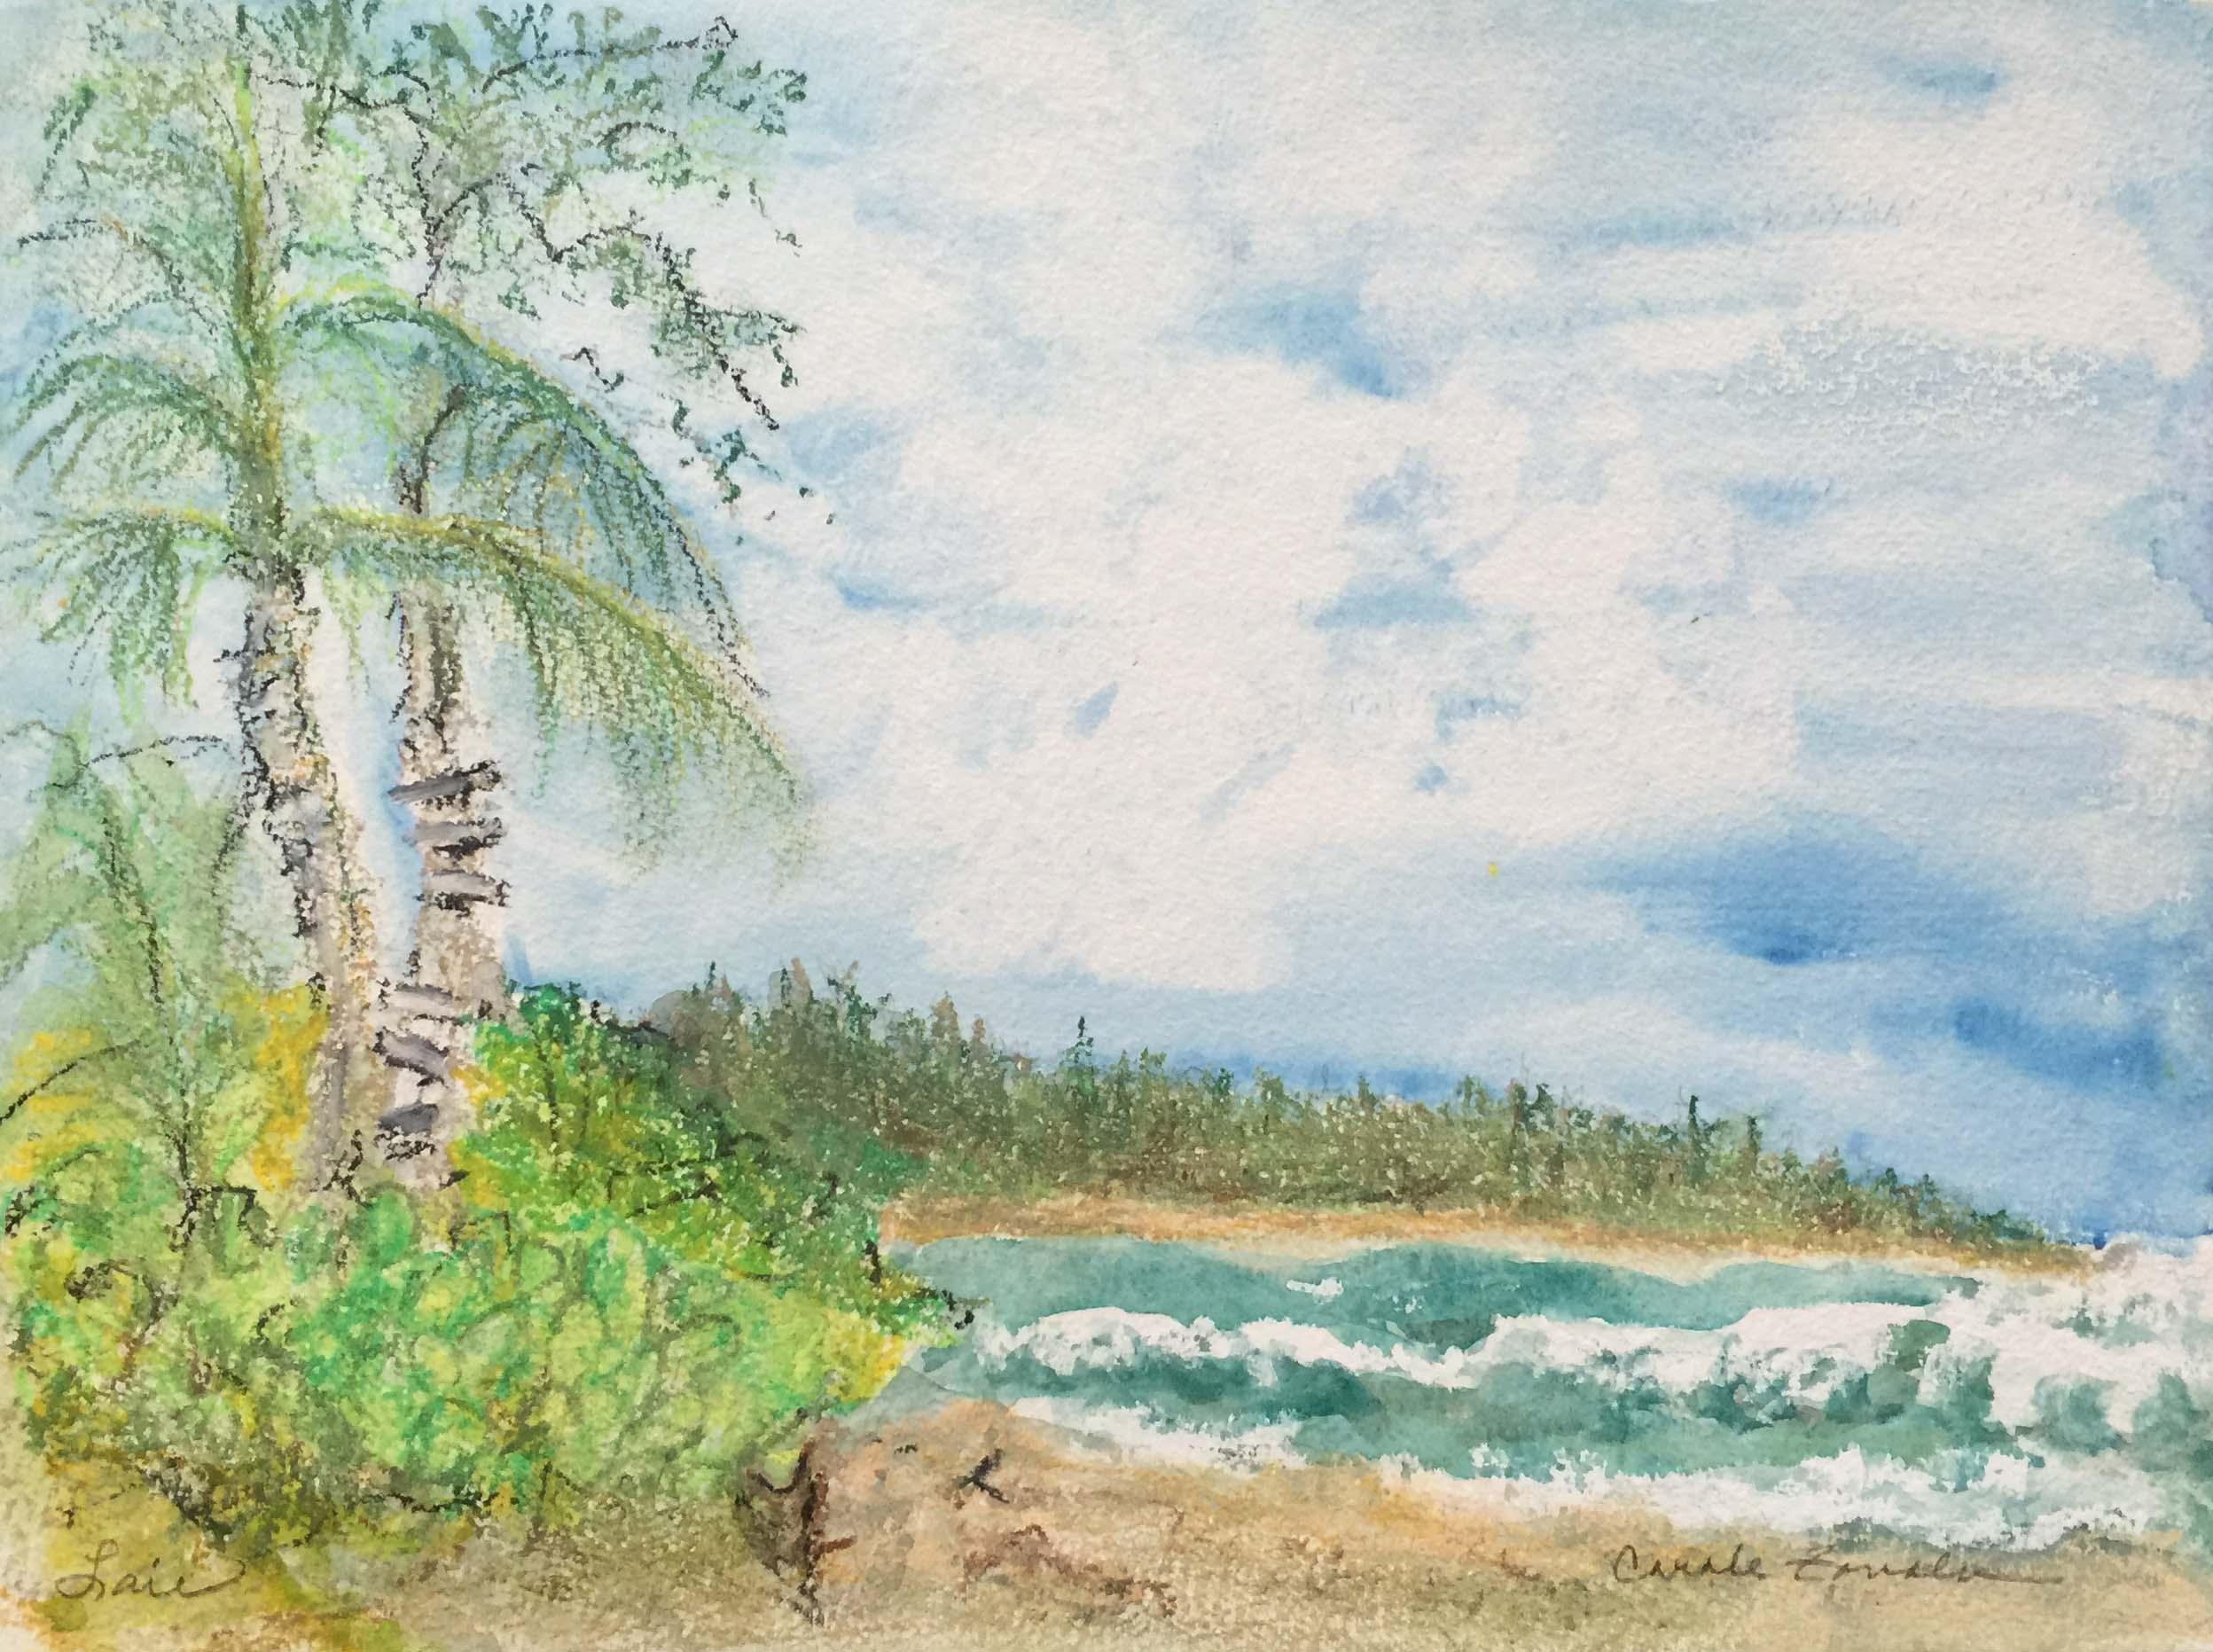 Laie - North Shore Oahue